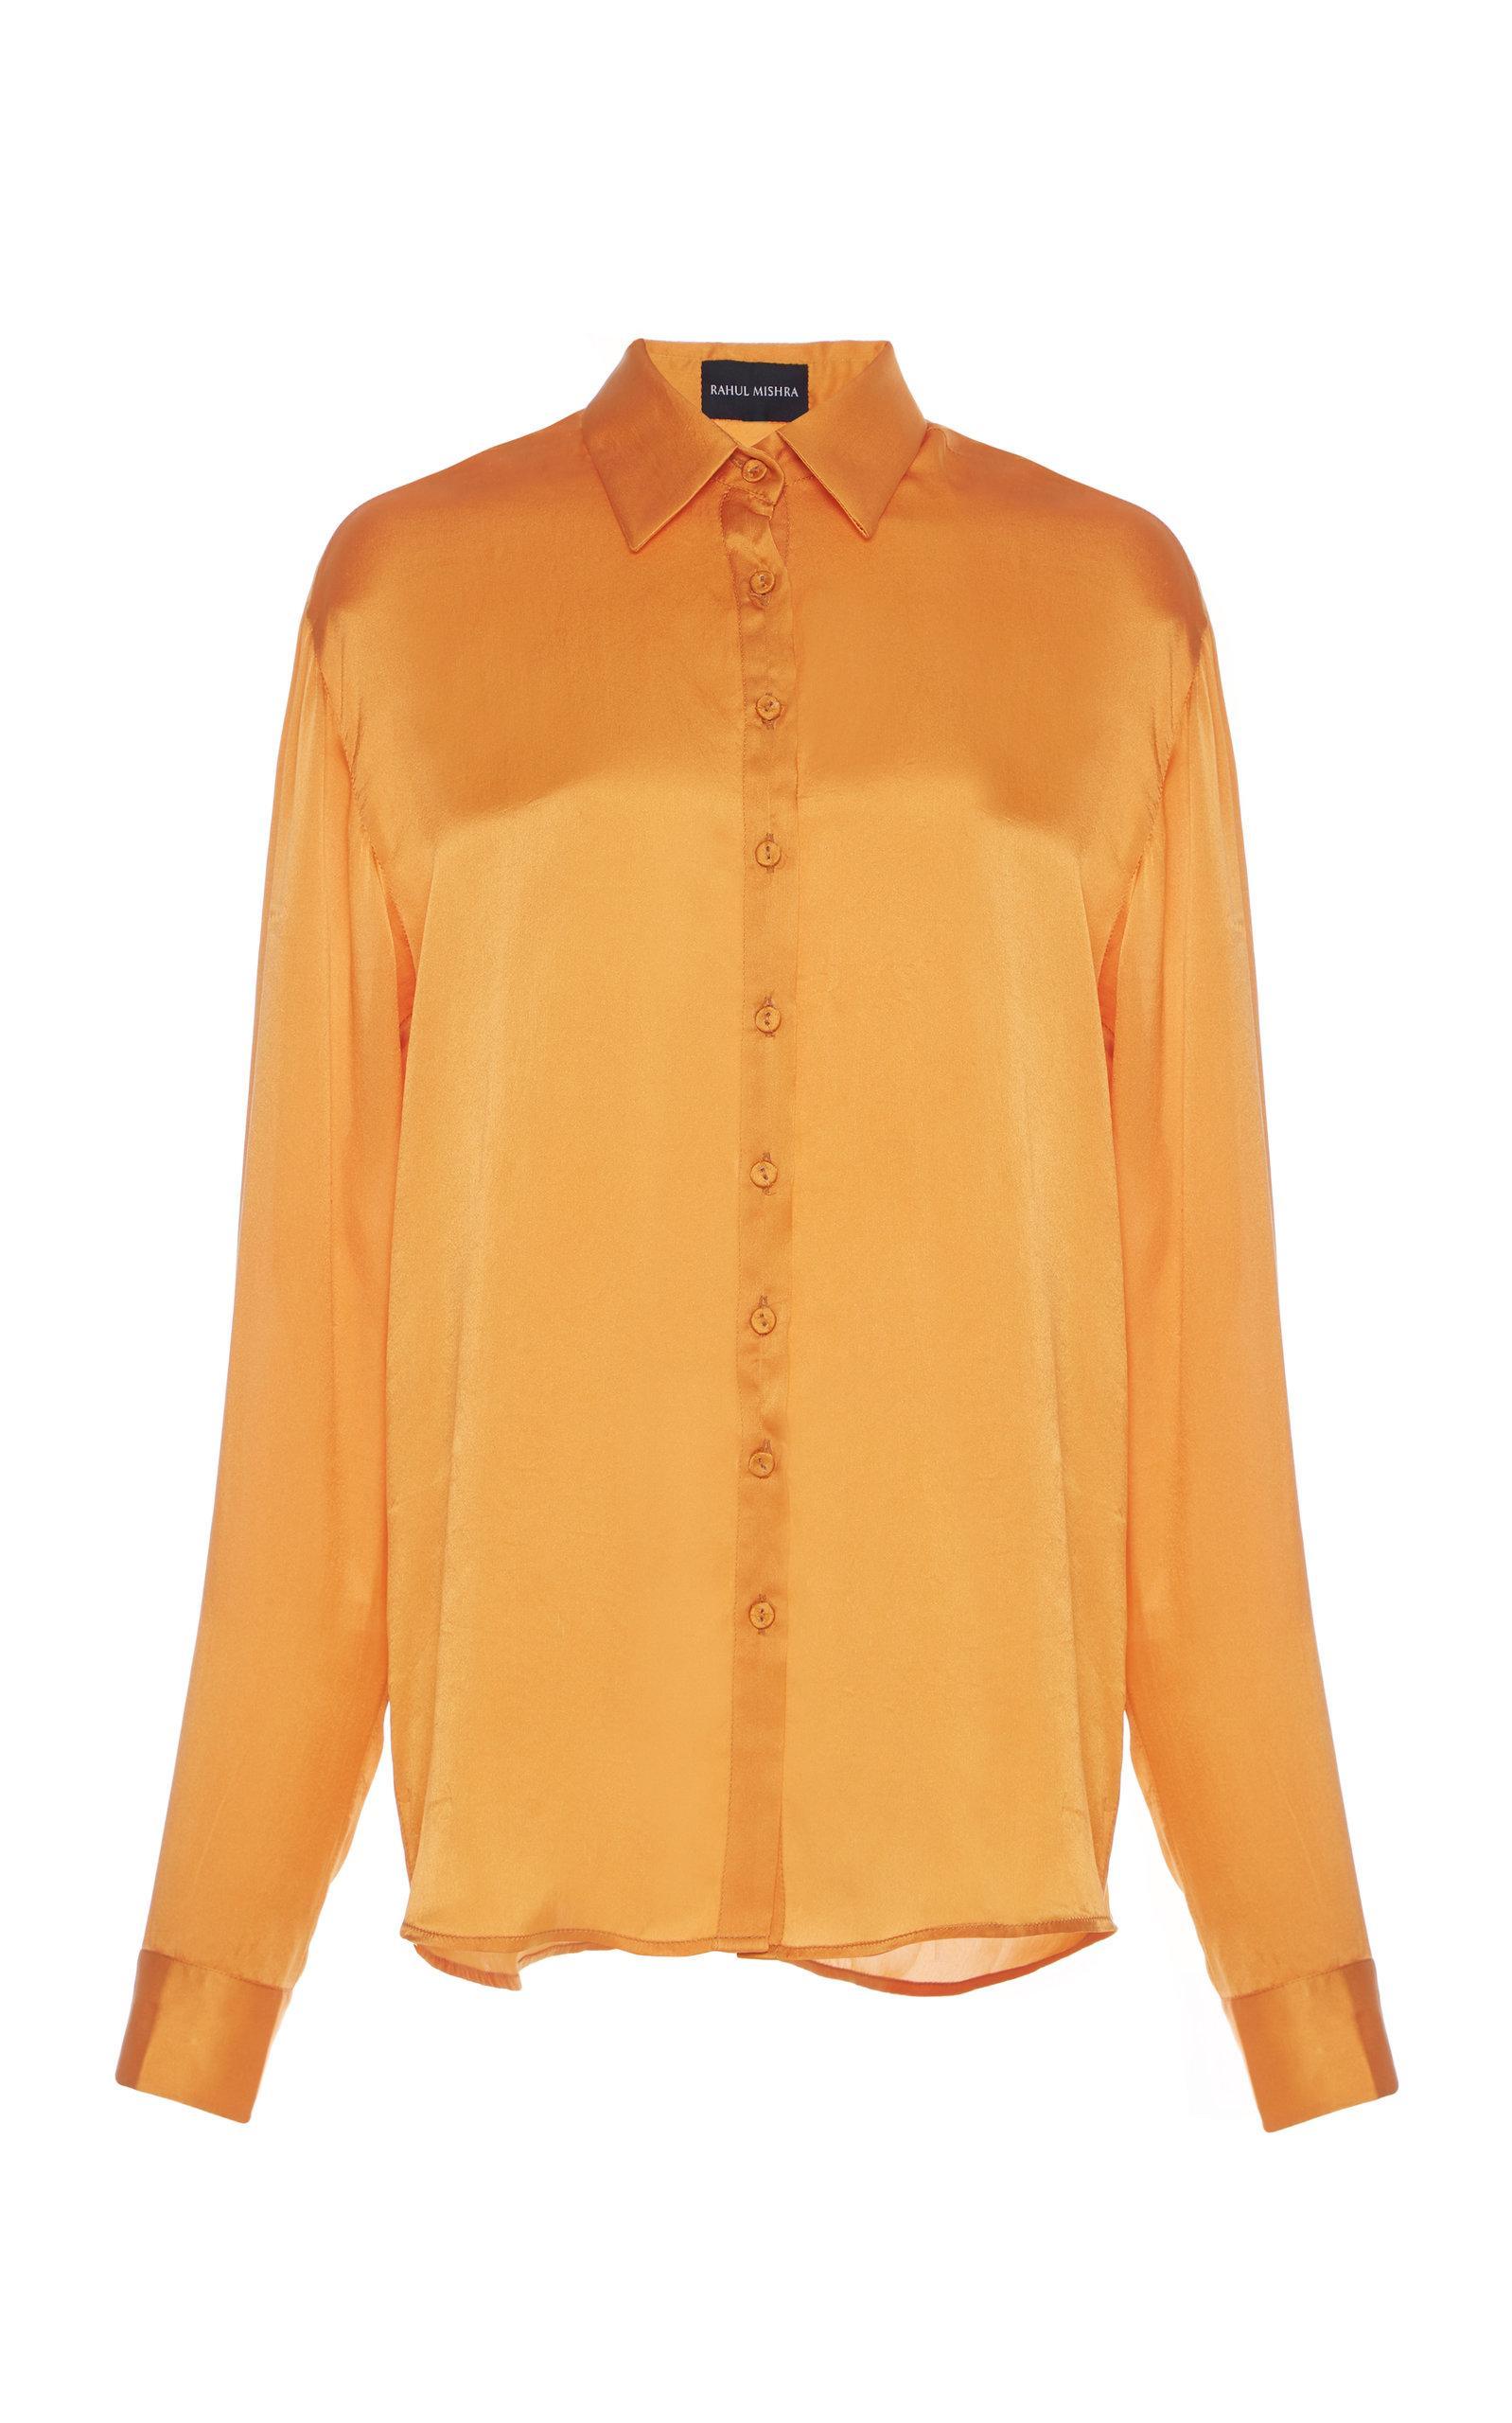 Rahul Mishra Silk Collared Blouse In Orange